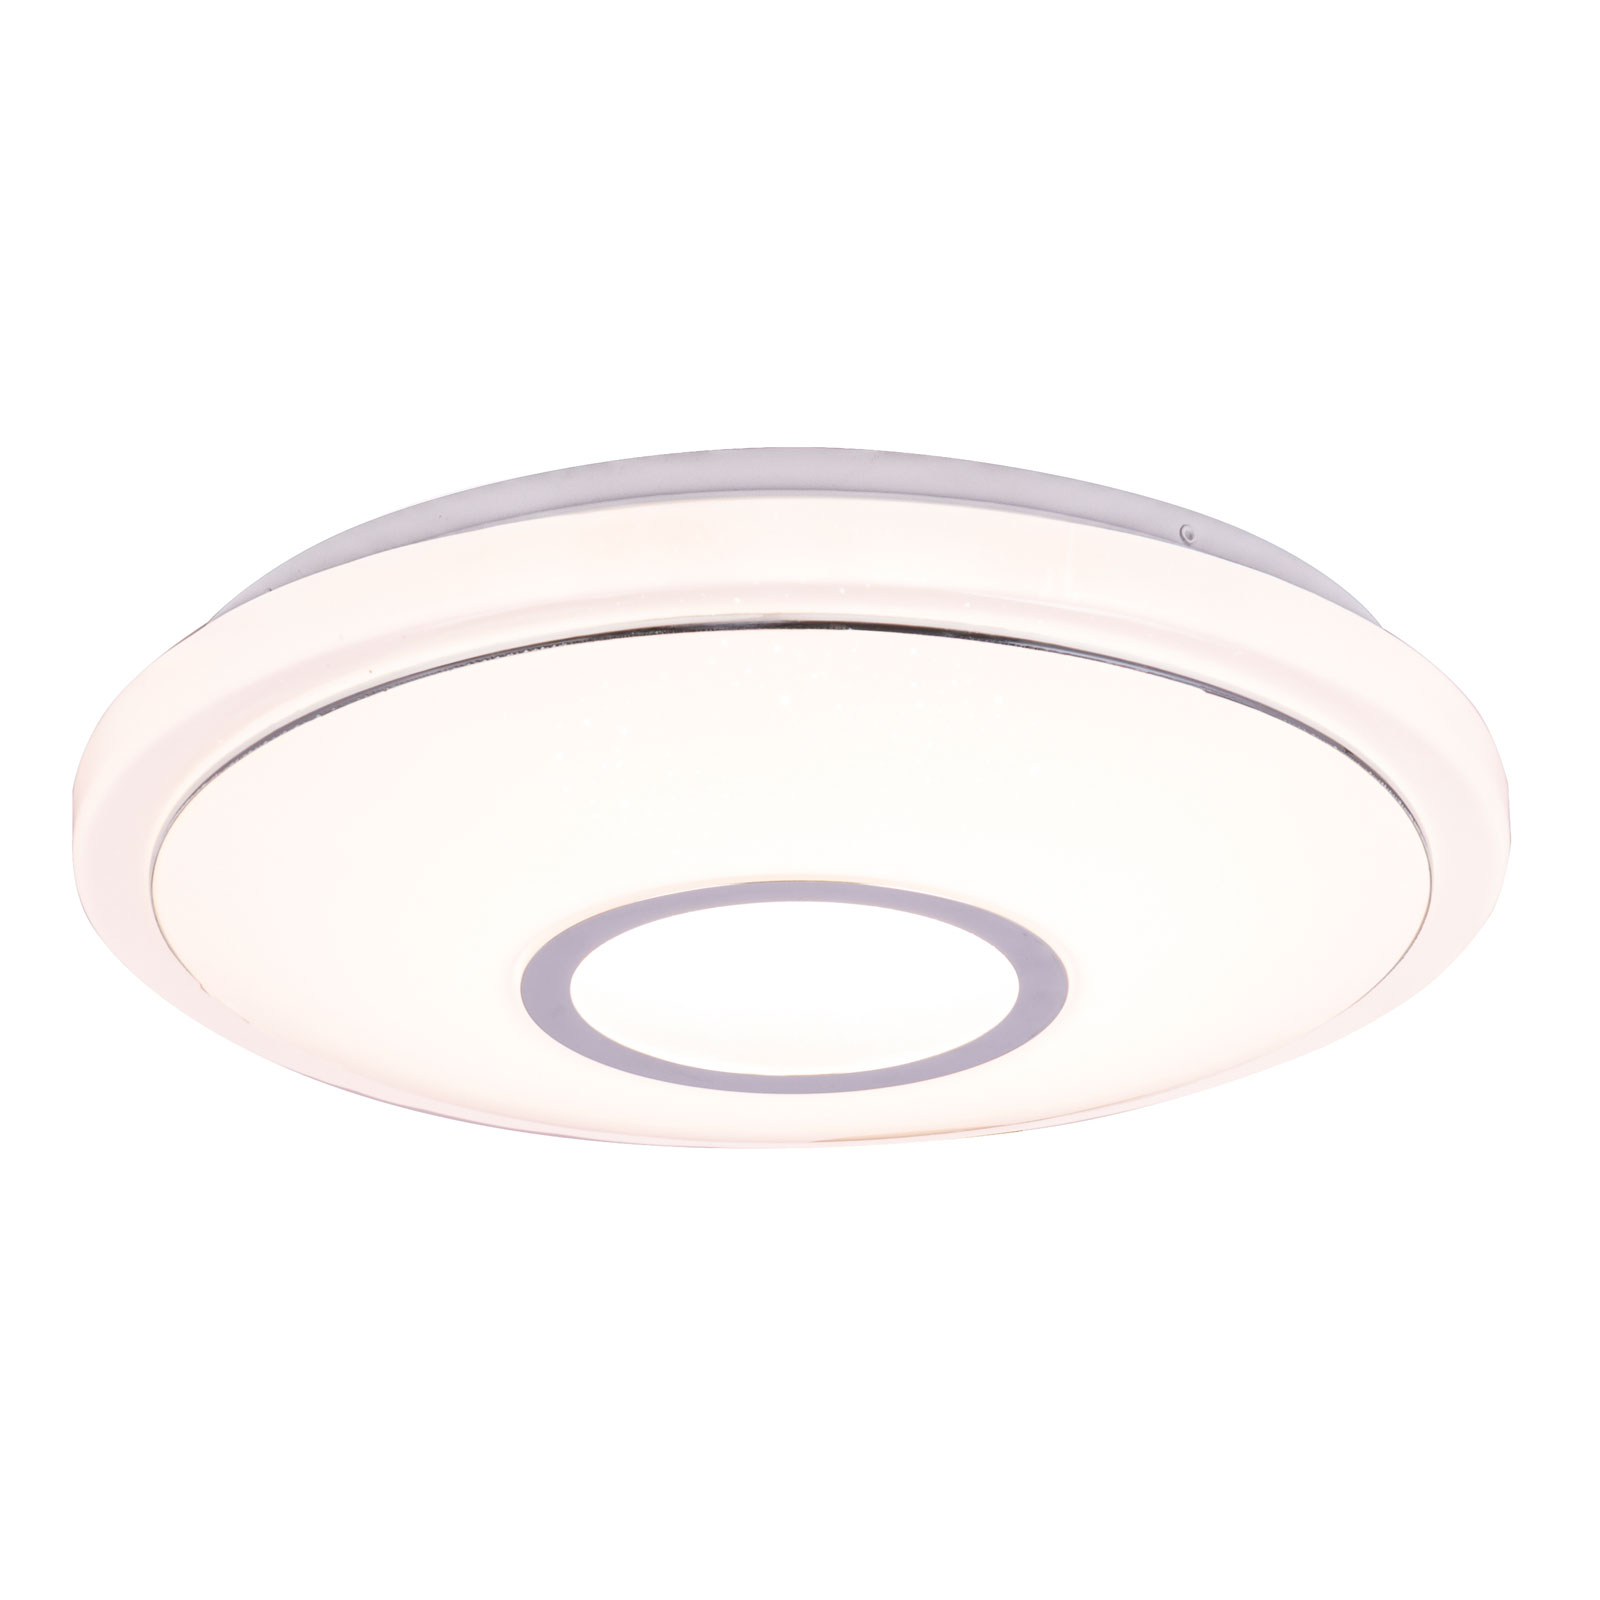 Lampa sufitowa LED Conner, Tuya-Smart, Ø 40 cm